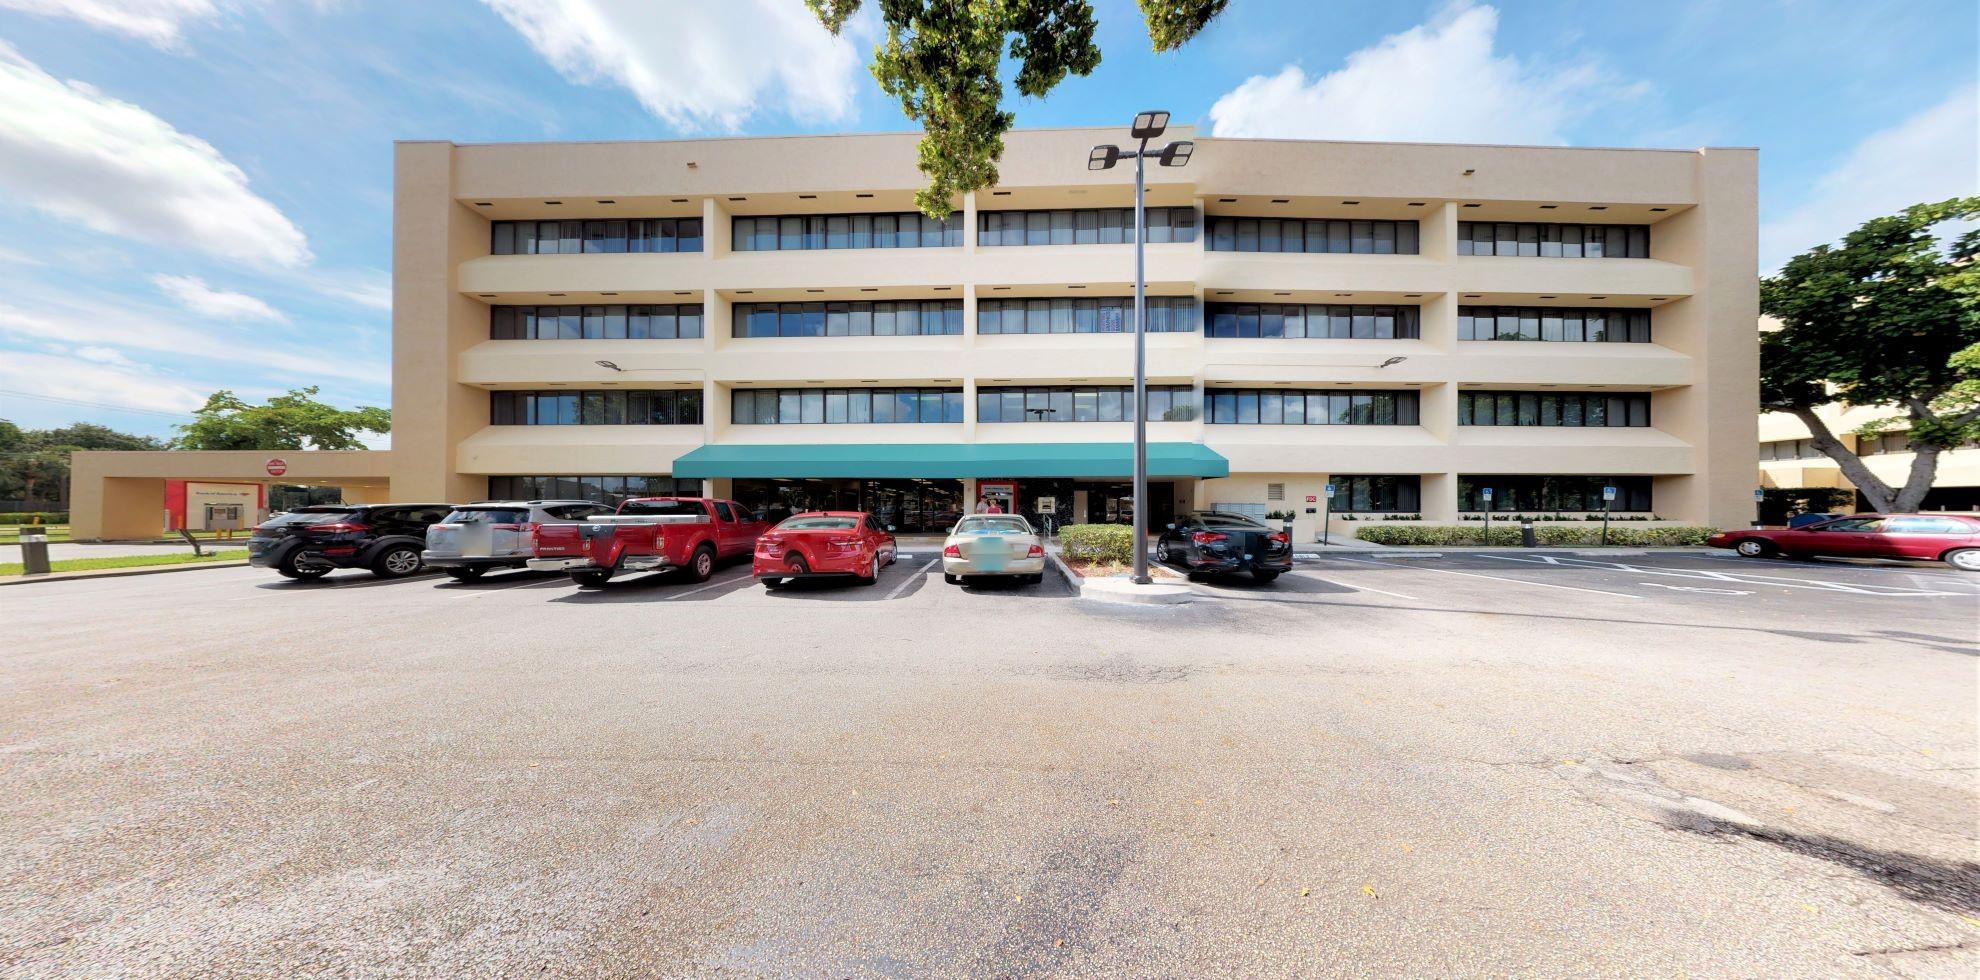 Bank of America financial center with drive-thru ATM and teller | 1701 W Hillsboro Blvd, Deerfield Beach, FL 33442